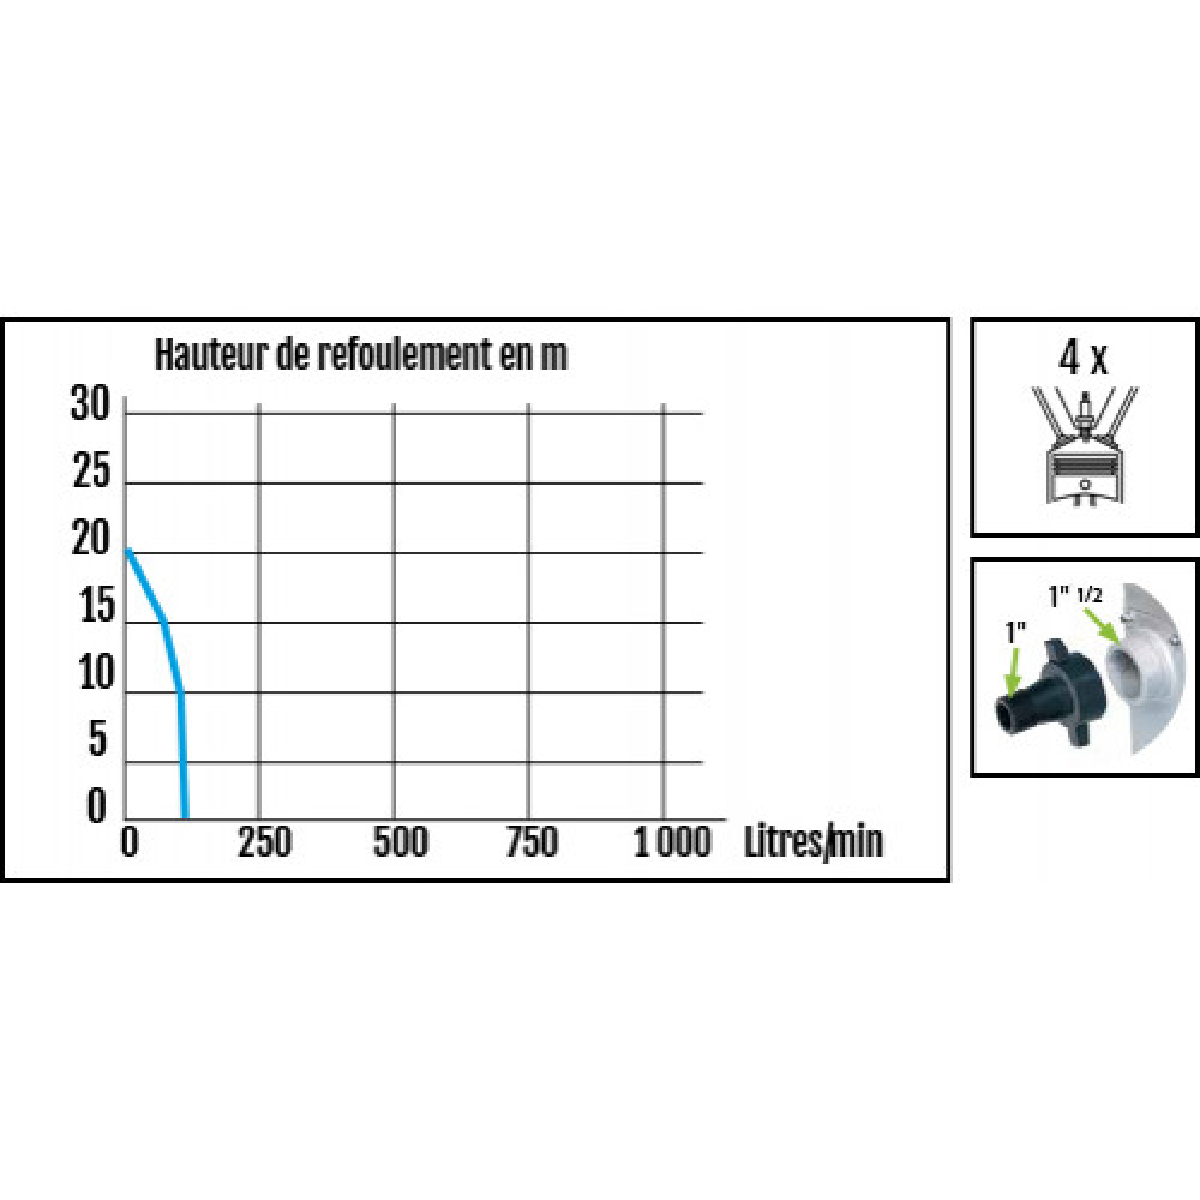 Ribiland Motopompe 7000 l/h 2,4 HP - 4 temps - PRMPP098